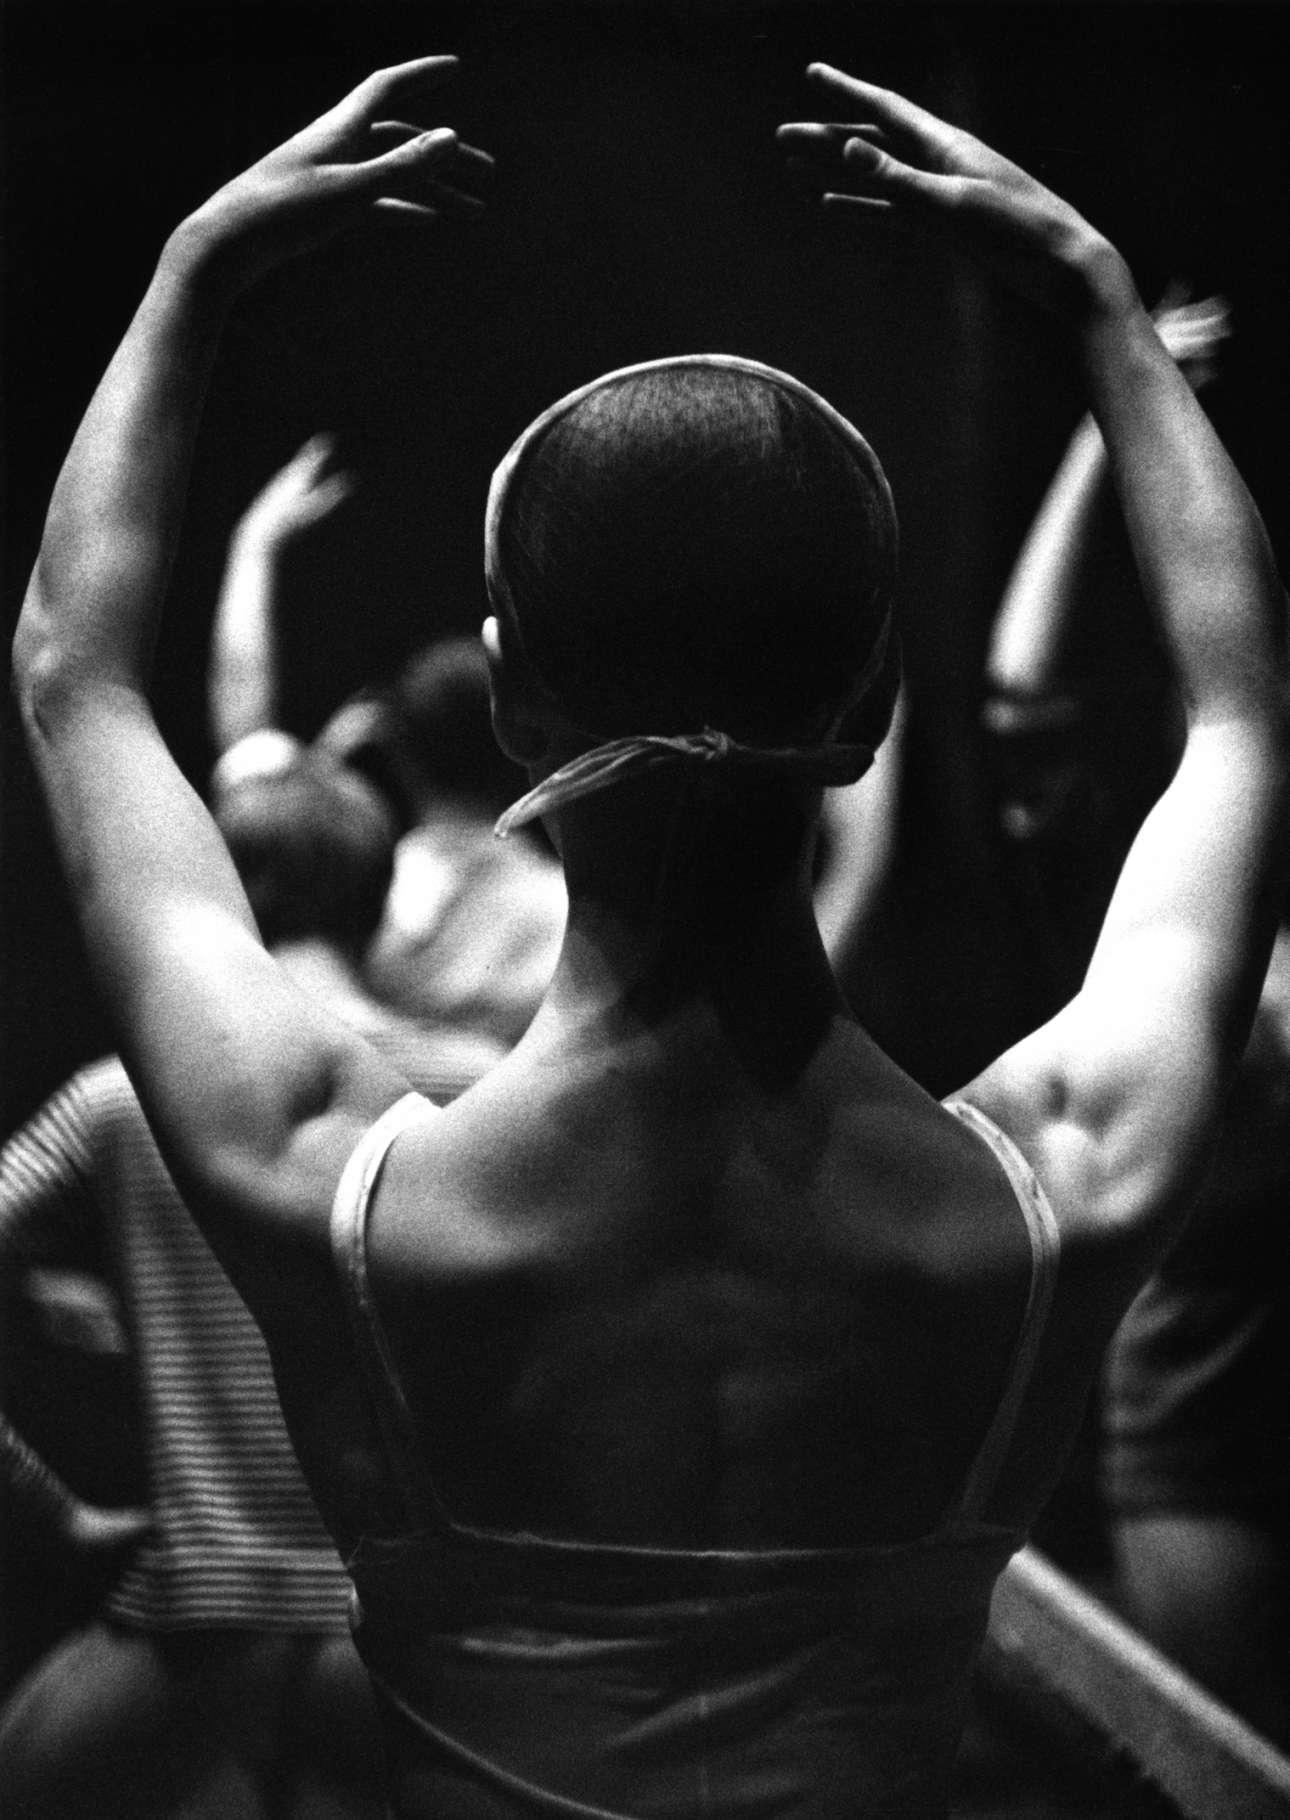 H Ελεν Σταρ σε μεικτή τάξη που πραγματοποιείται στη σκηνή του Royal Ballet Touring Company στο Νιουκάστλ